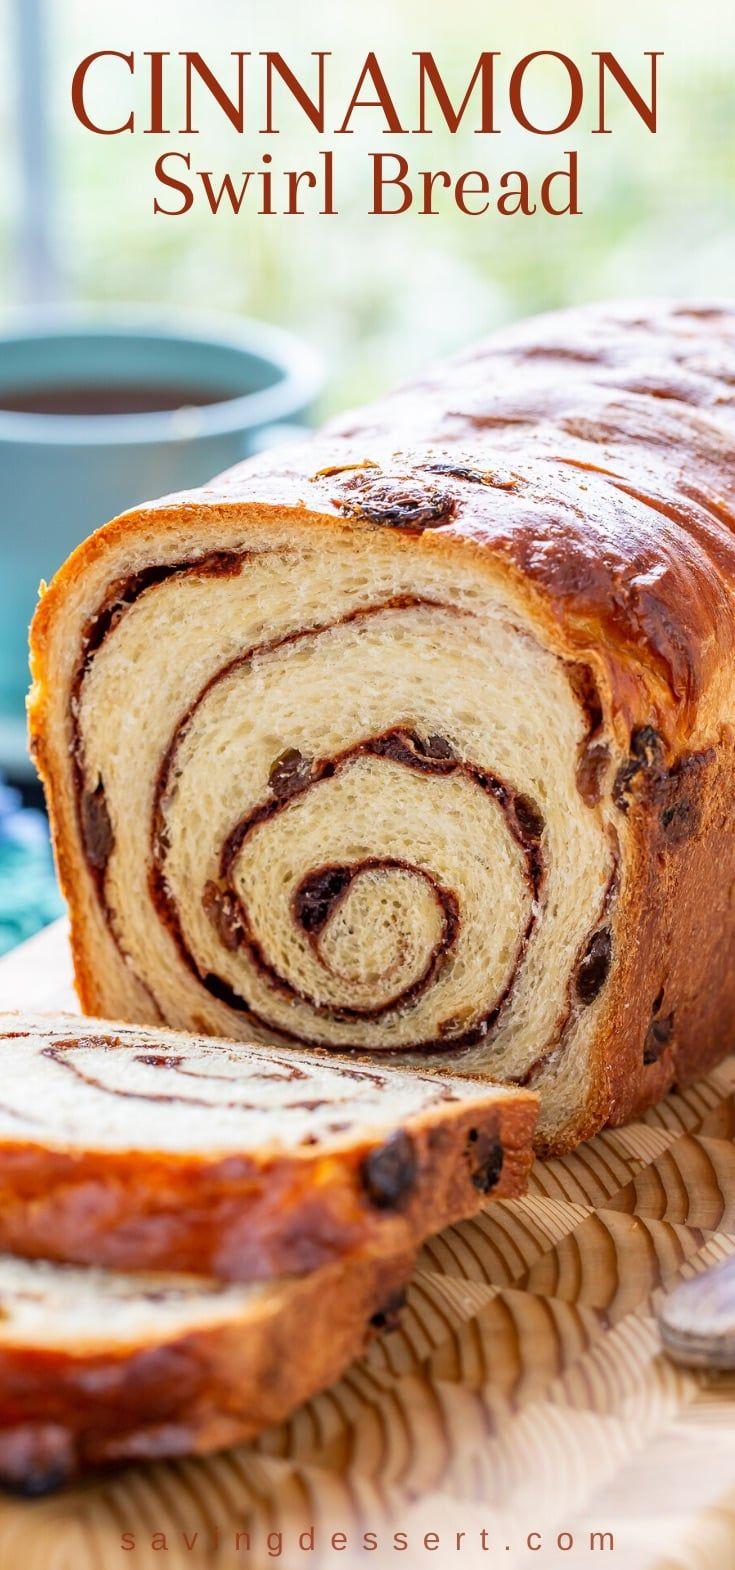 Cinnamon Swirl Bread Recipe Cinnamon Swirl Bread Swirl Bread Recipe Cinnamon Swirl Bread Recipe